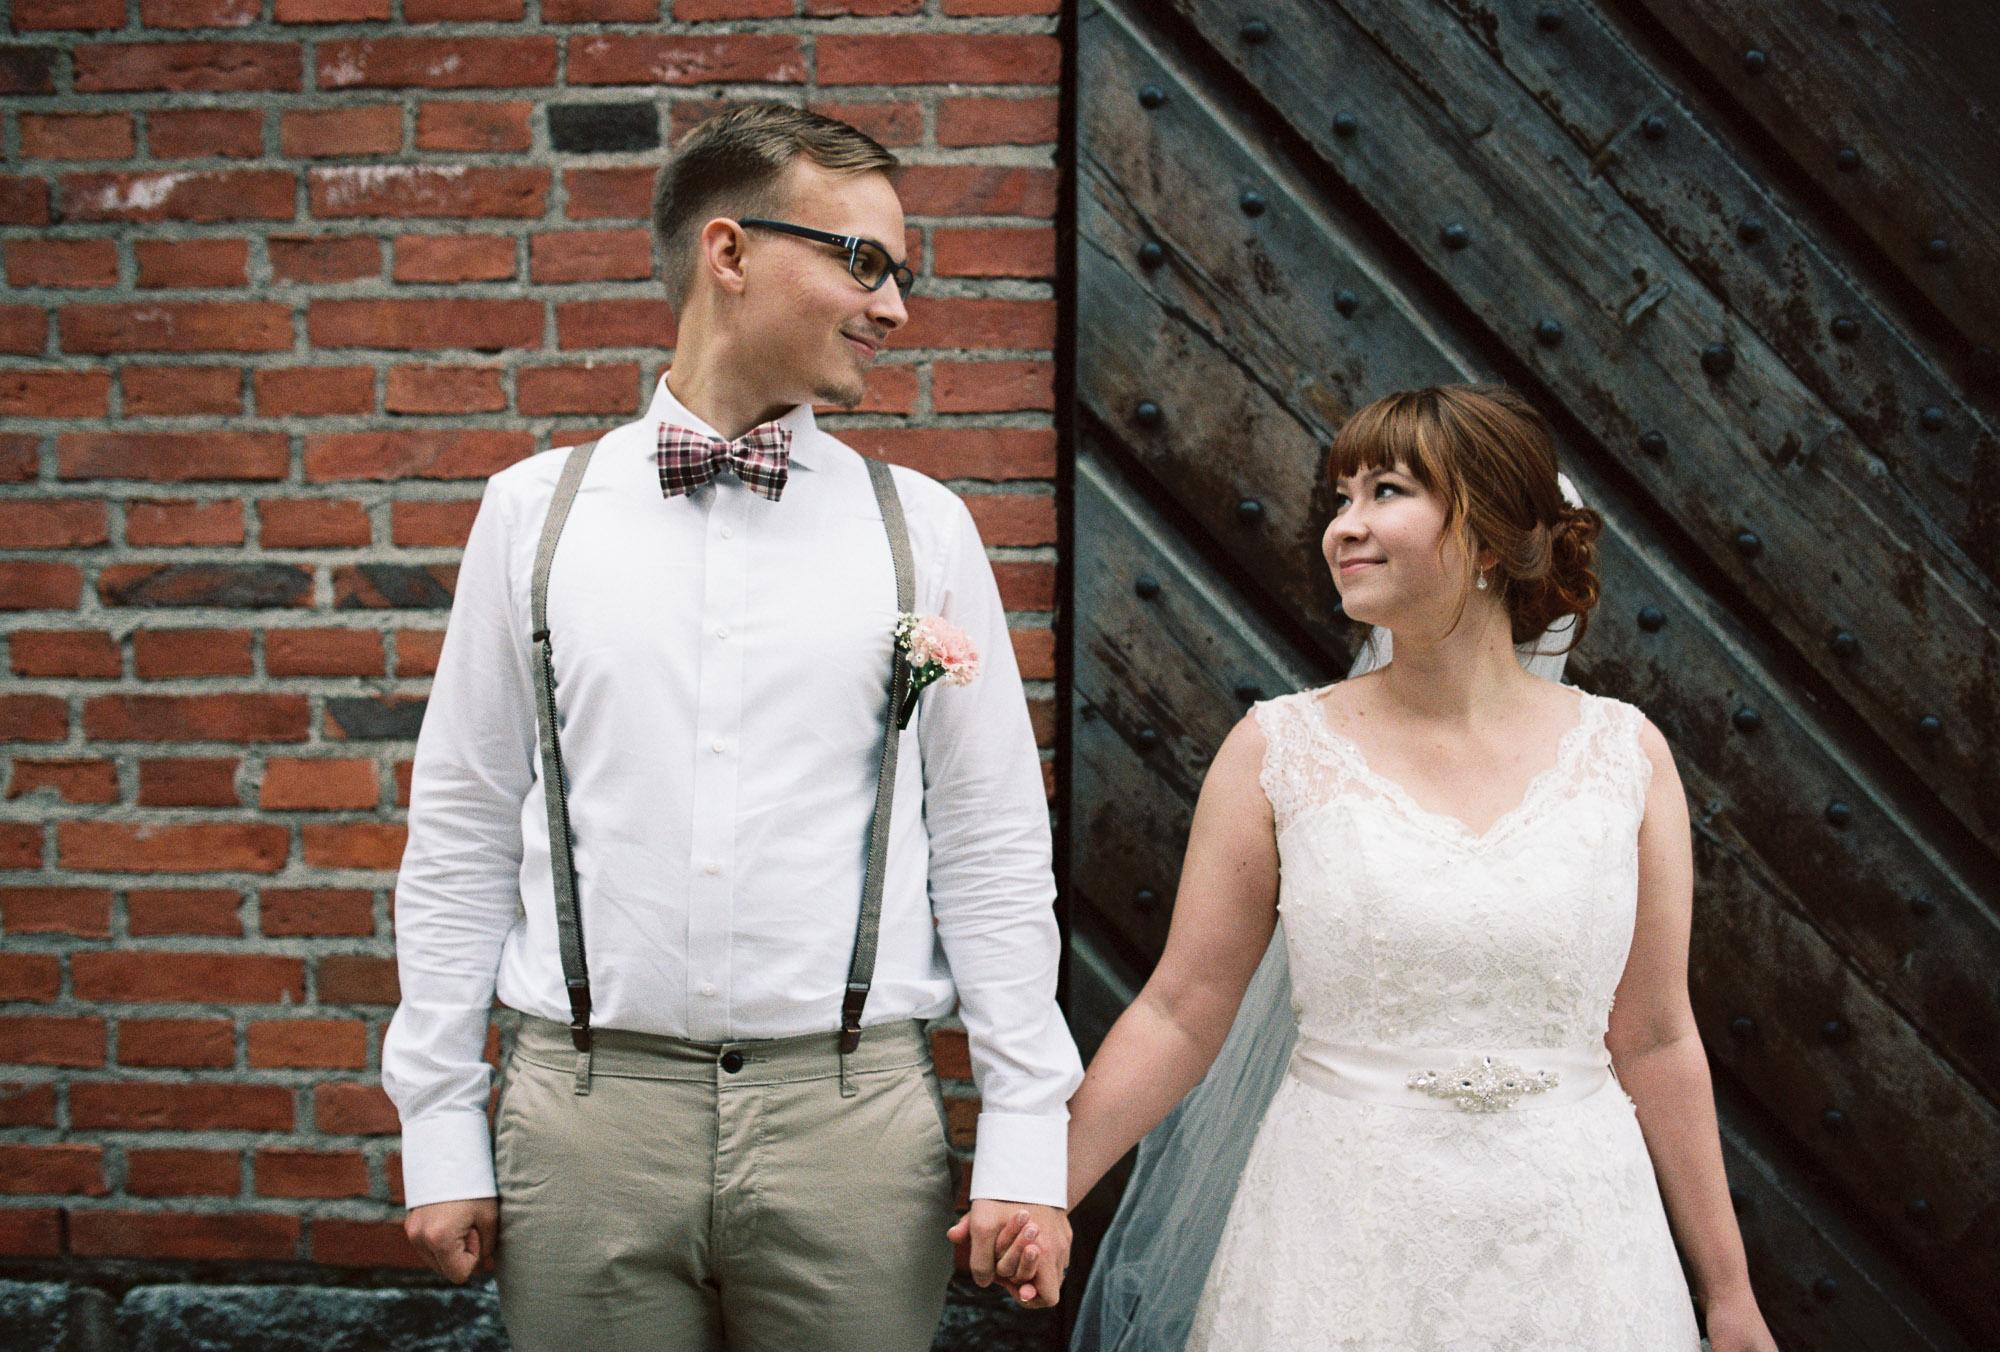 jere-satamo-analog-film-wedding-photographer-finland-170.jpg